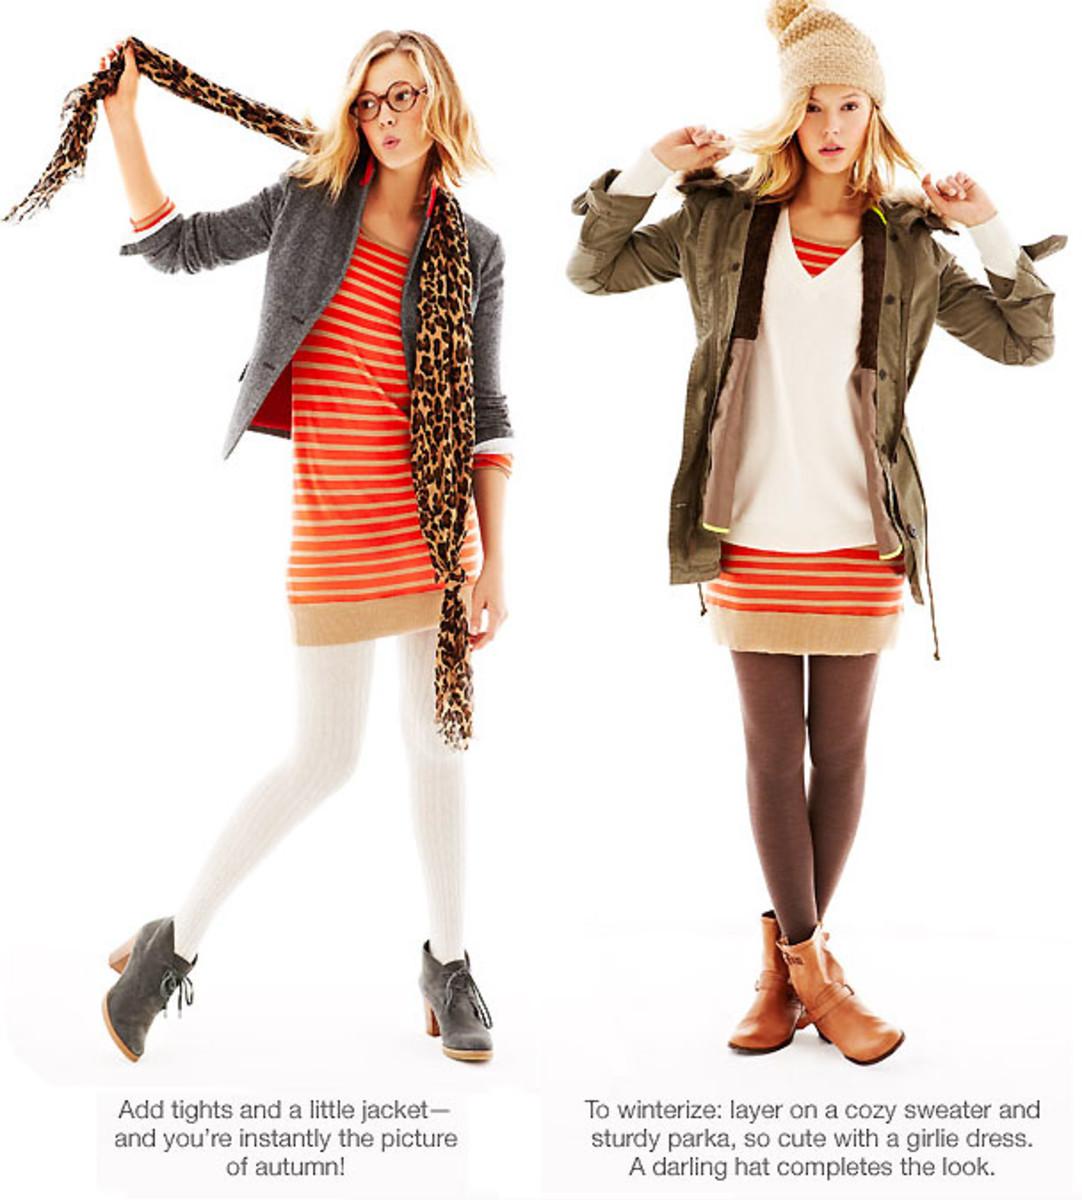 GAP dress advice 2 and 3